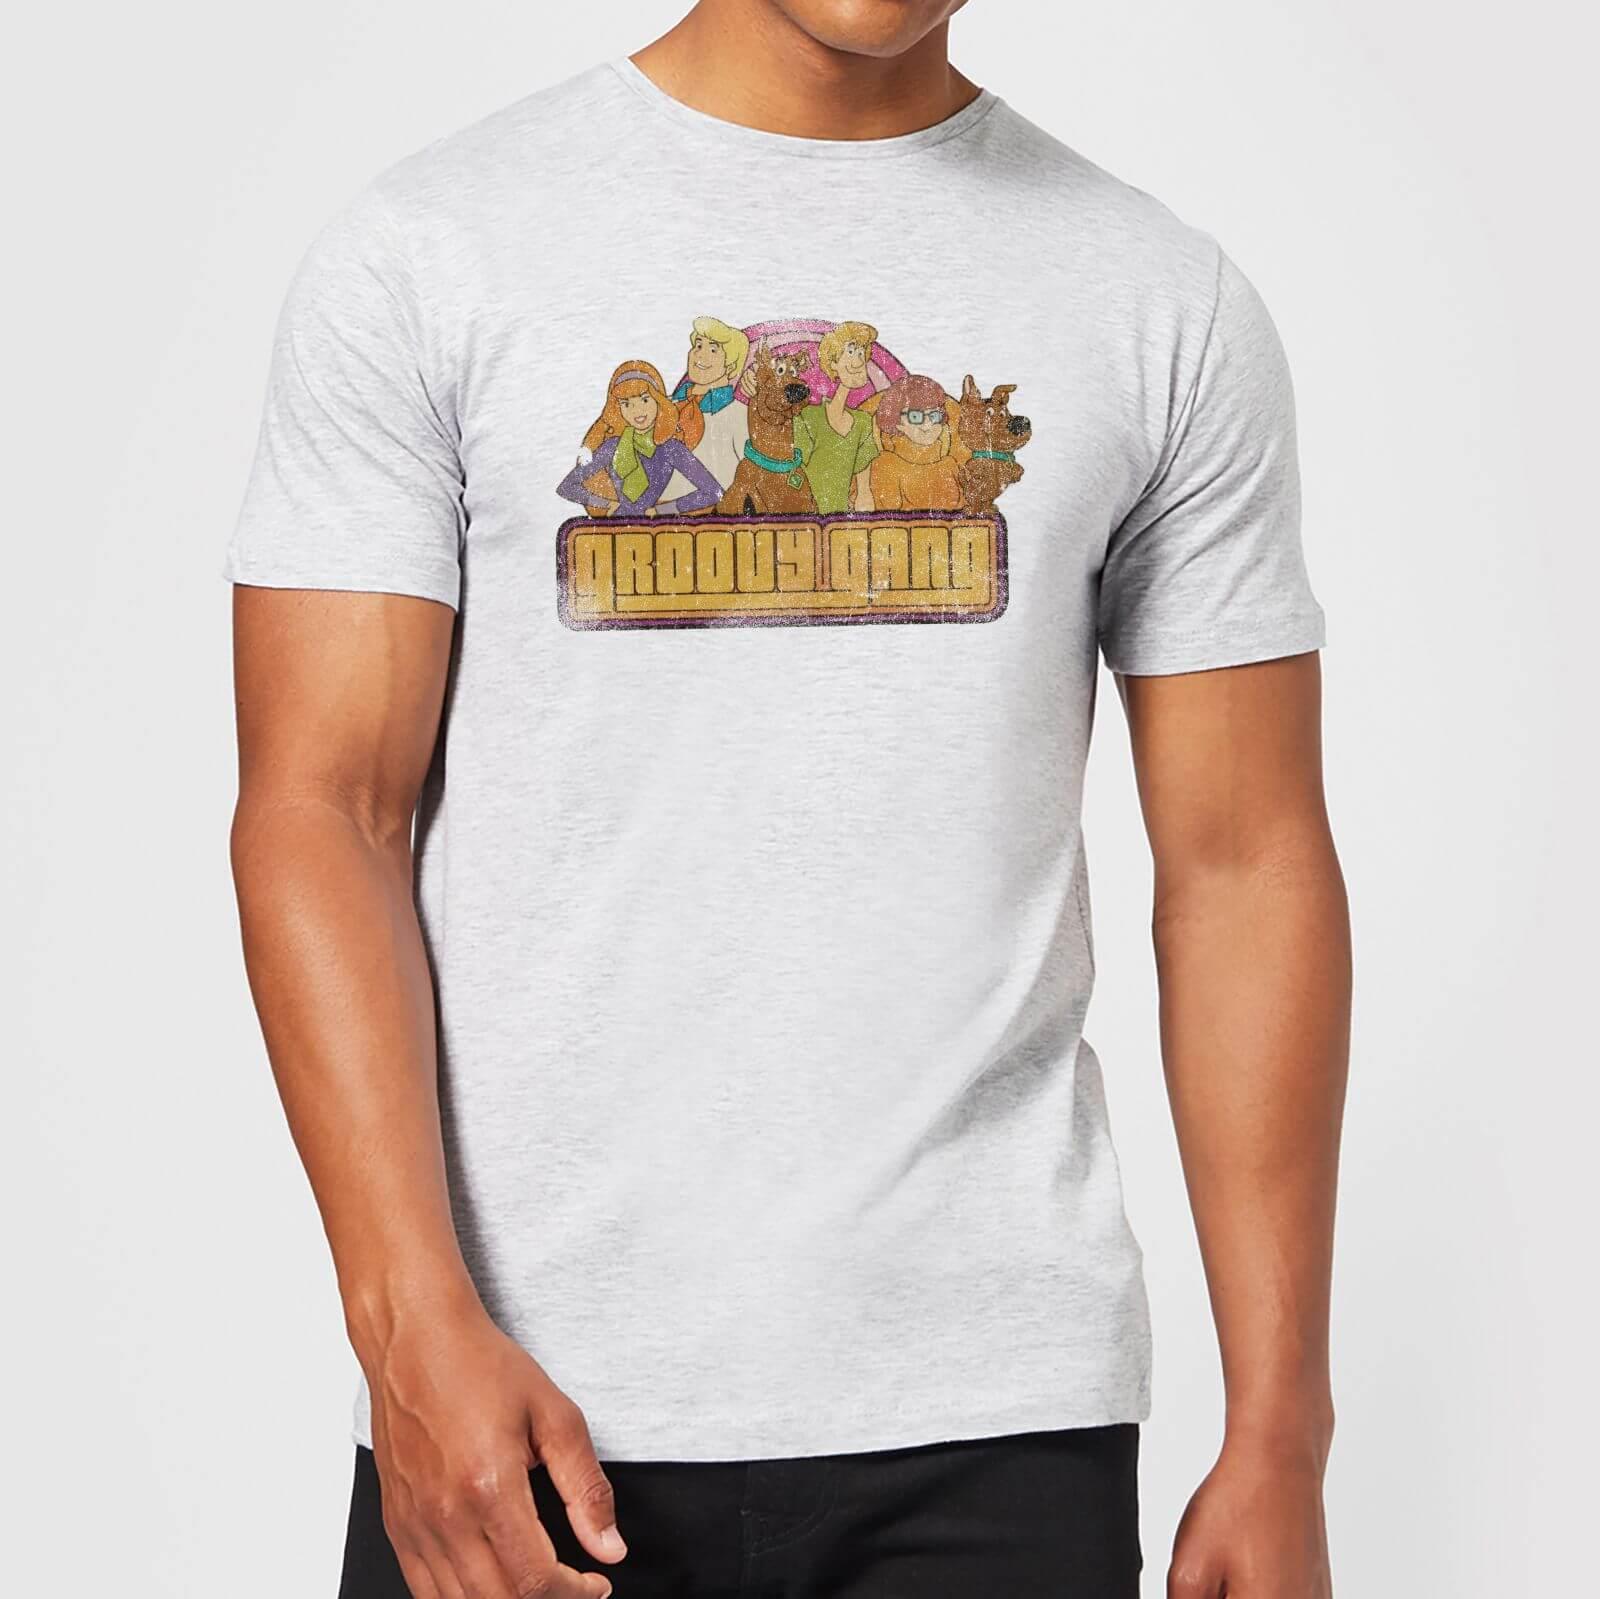 Scooby Doo Groovy Gang Men's T-Shirt - Grey - XXL - Grey